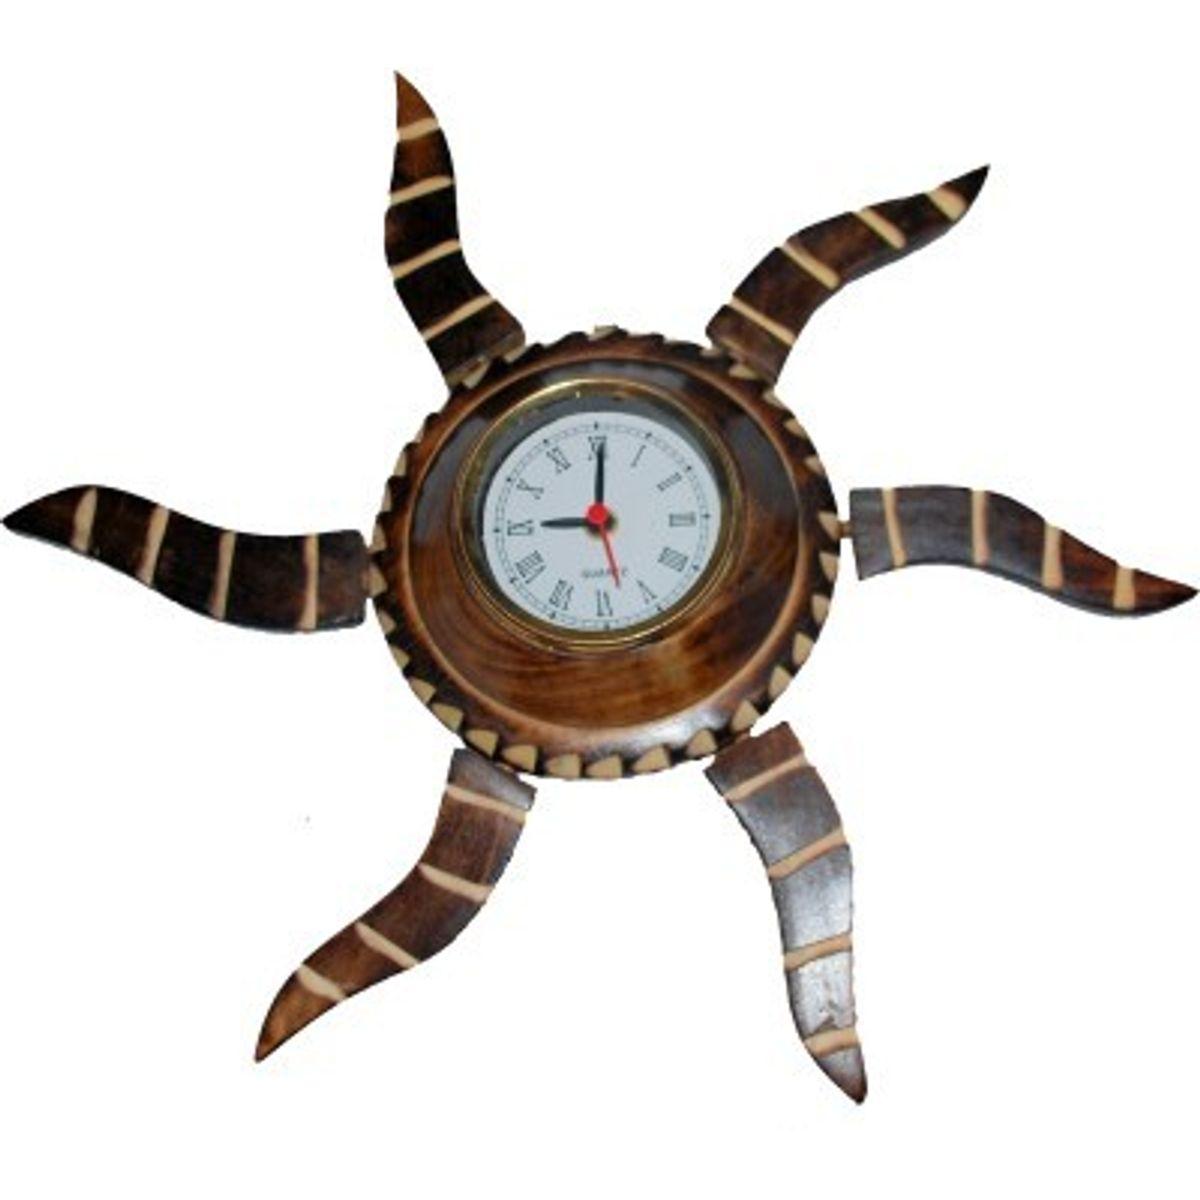 Onlineshoppee Wooden Antique Rising Sun Analog Wall Clock